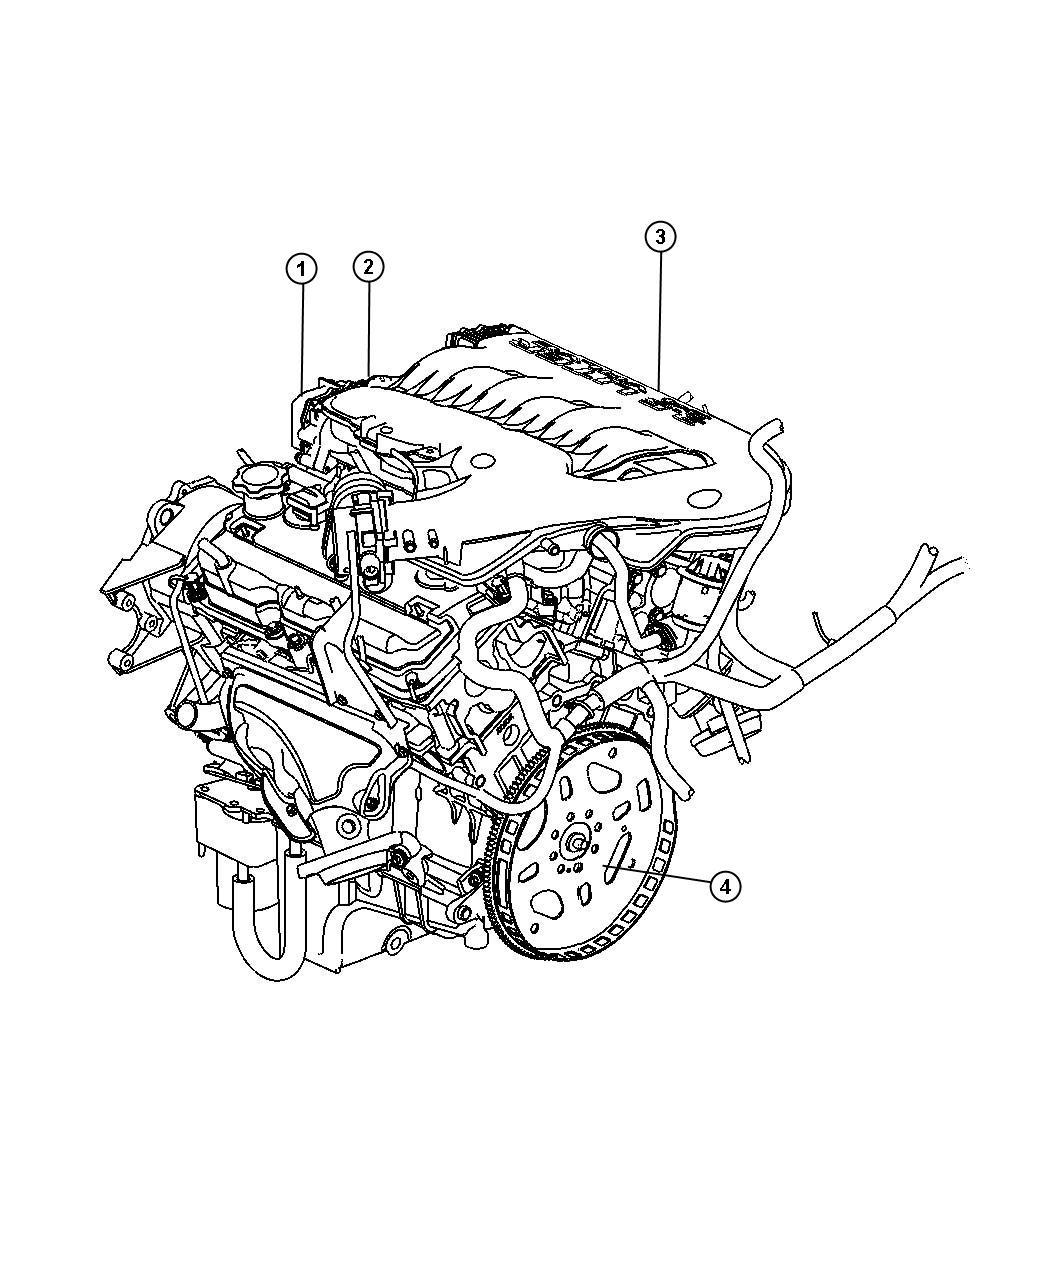 Dodge Charger Engine. Long block. Remanufactured